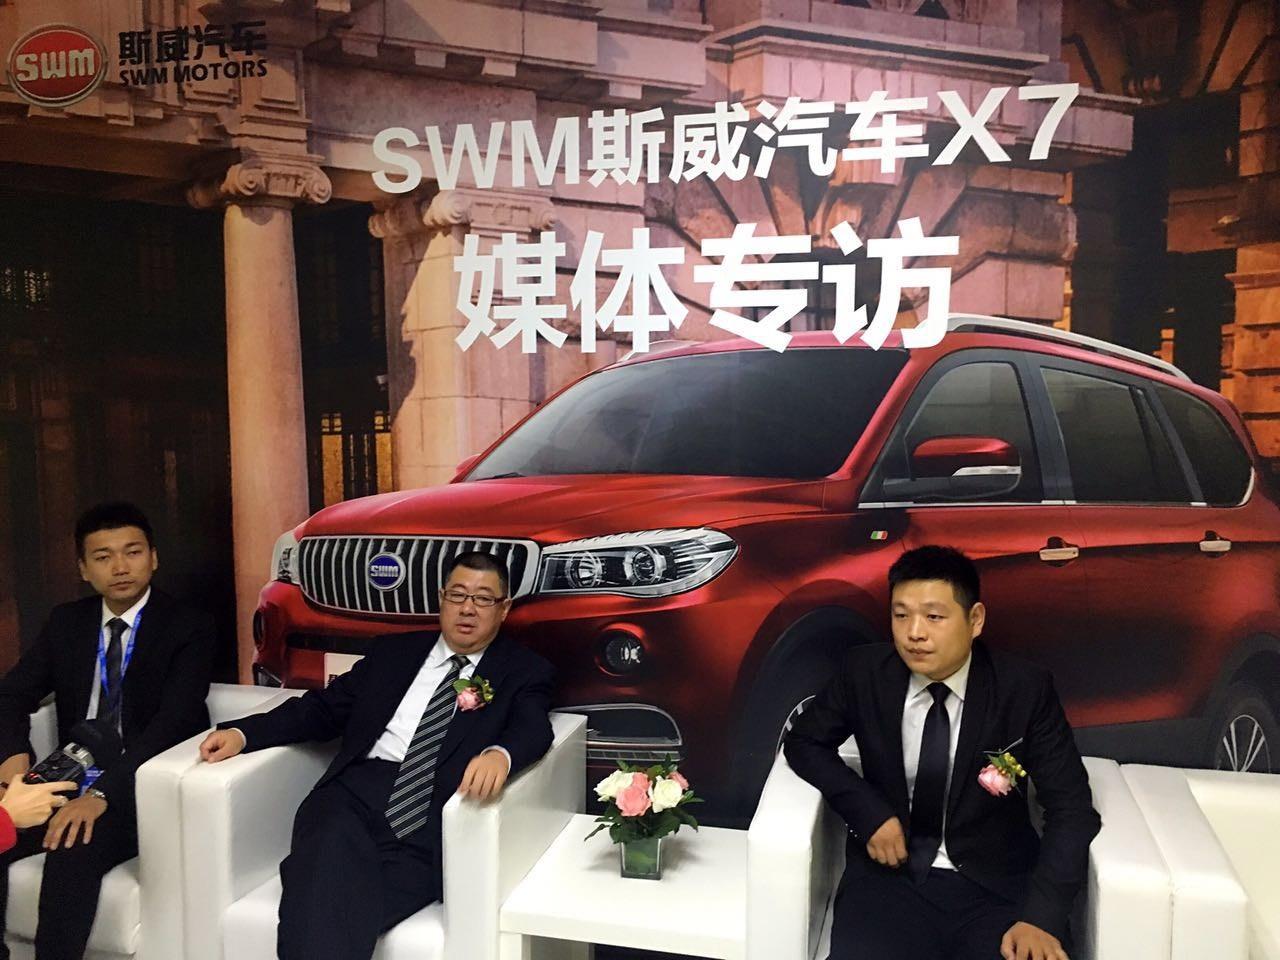 SWM斯威汽车X7沈阳上市发布会媒体专访